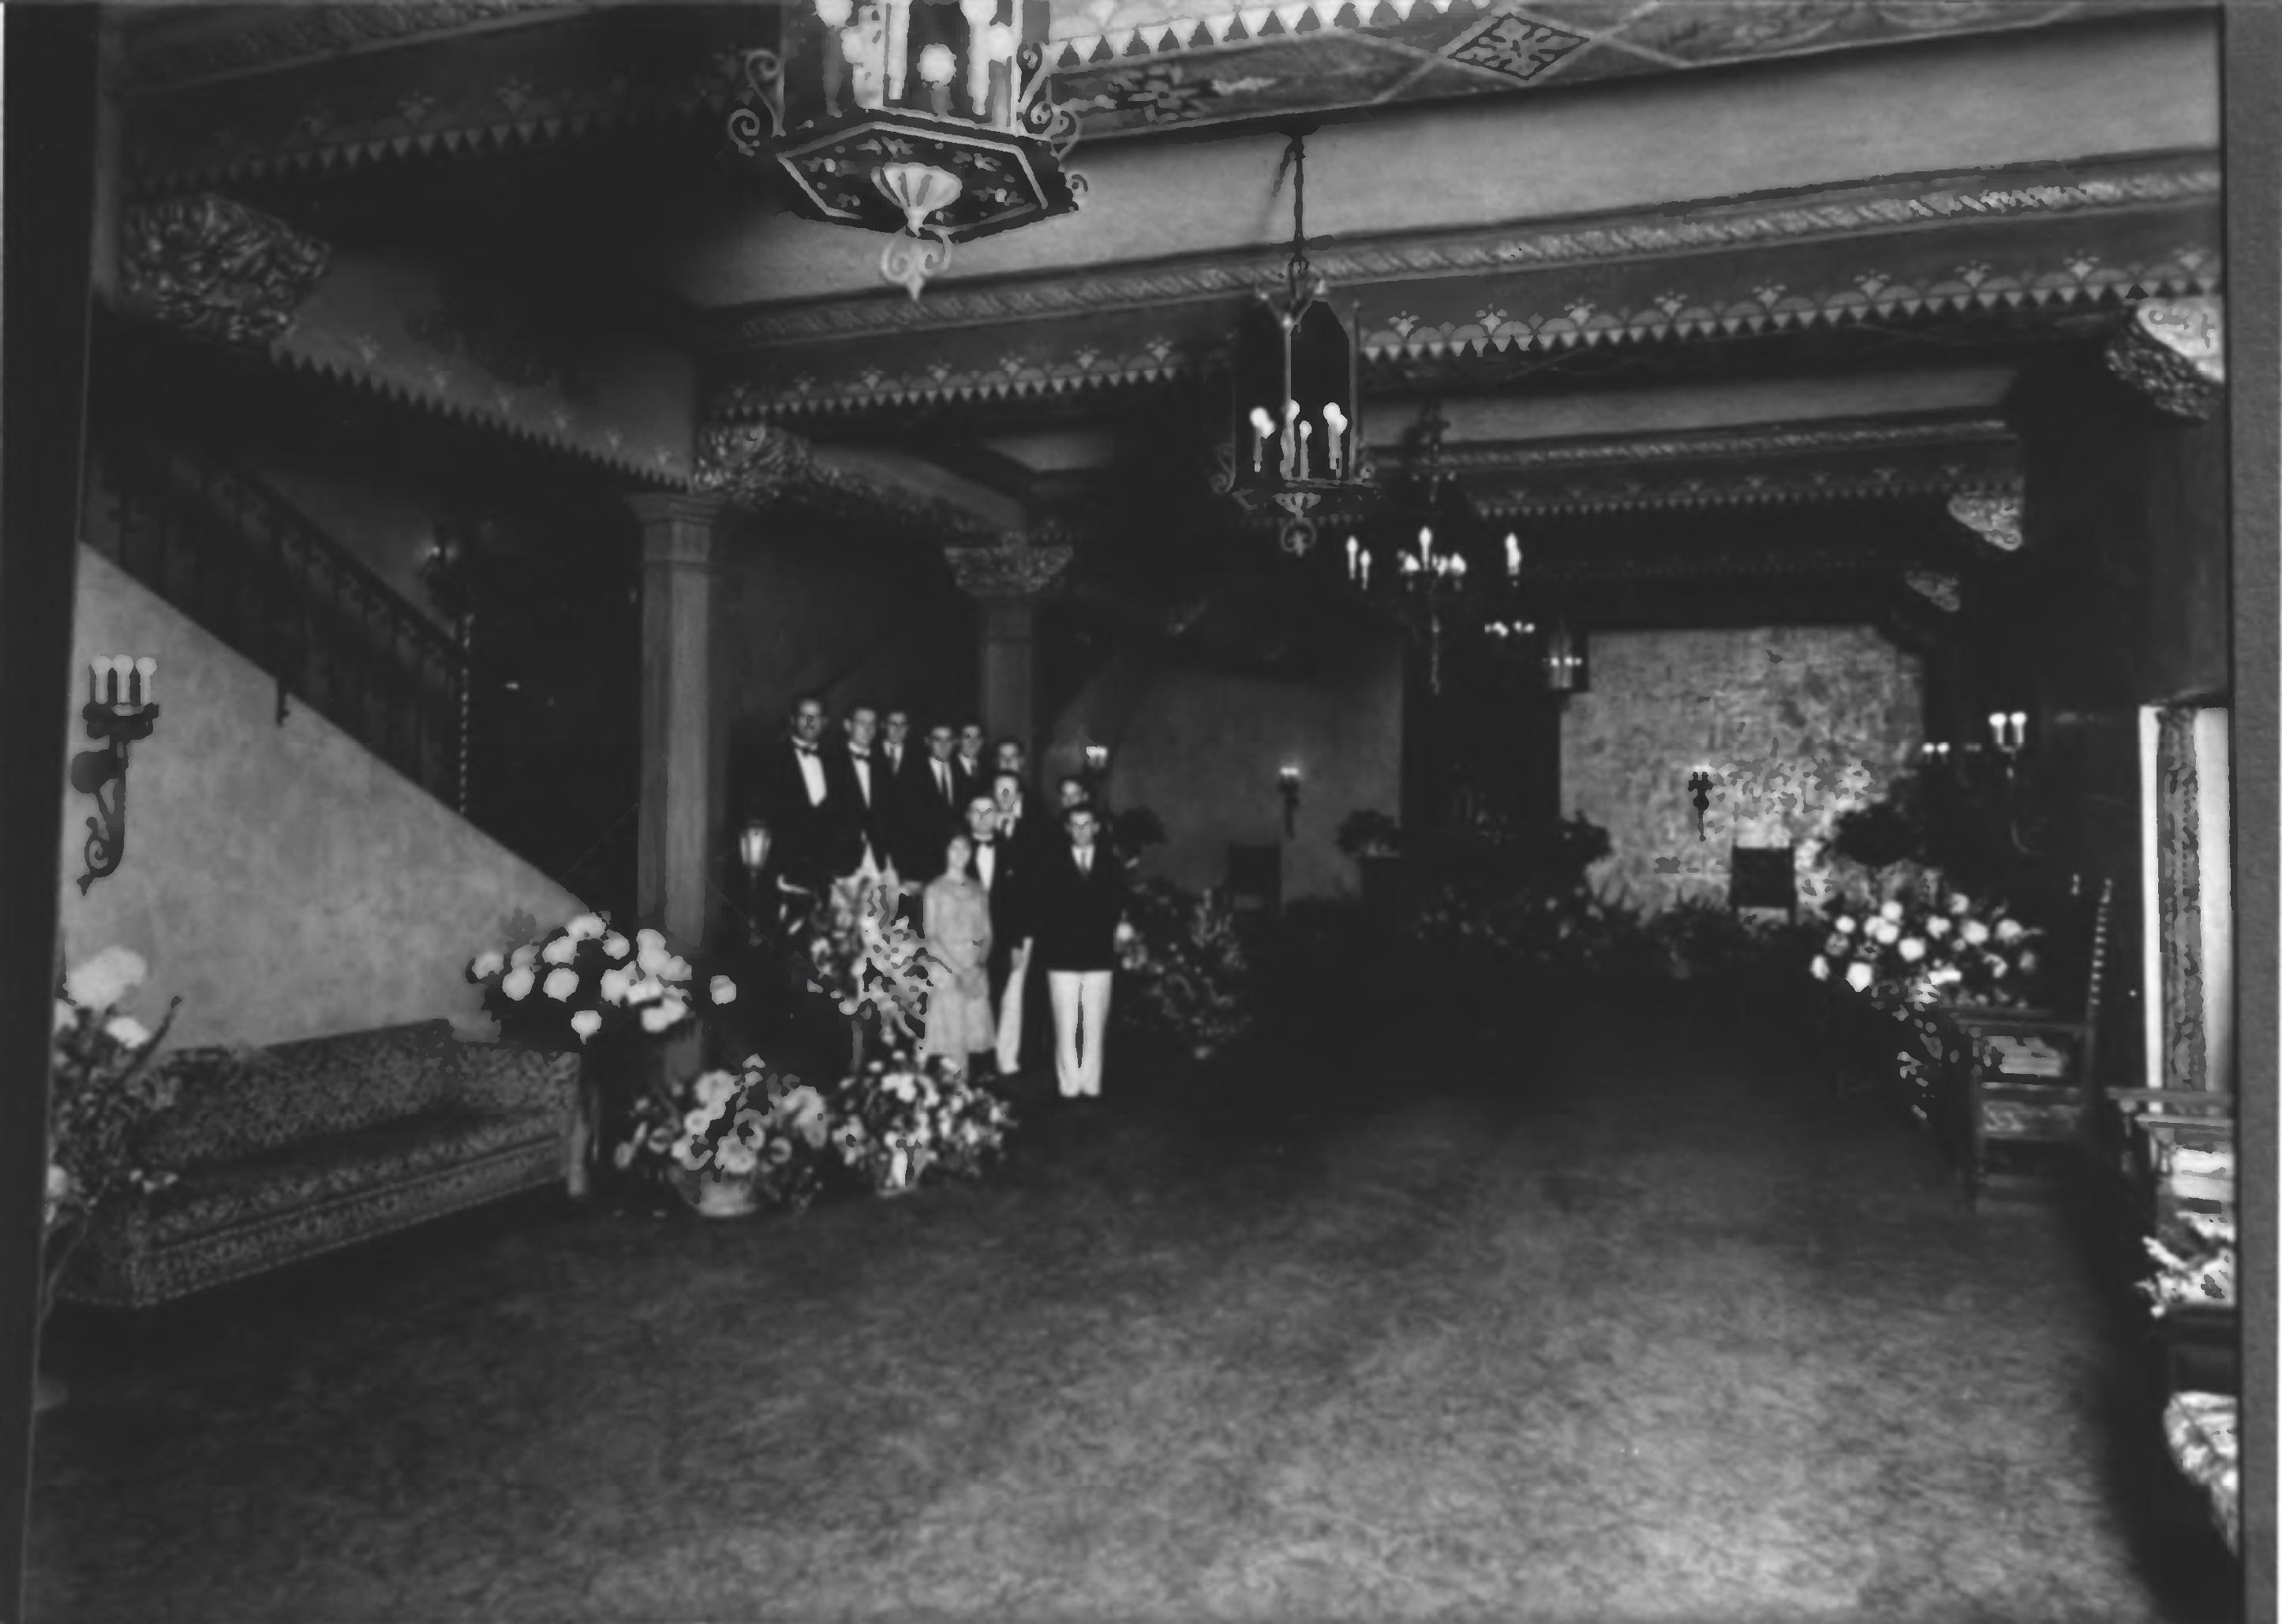 Ventura_Theater_1900s_vintage_old_historic_lobby